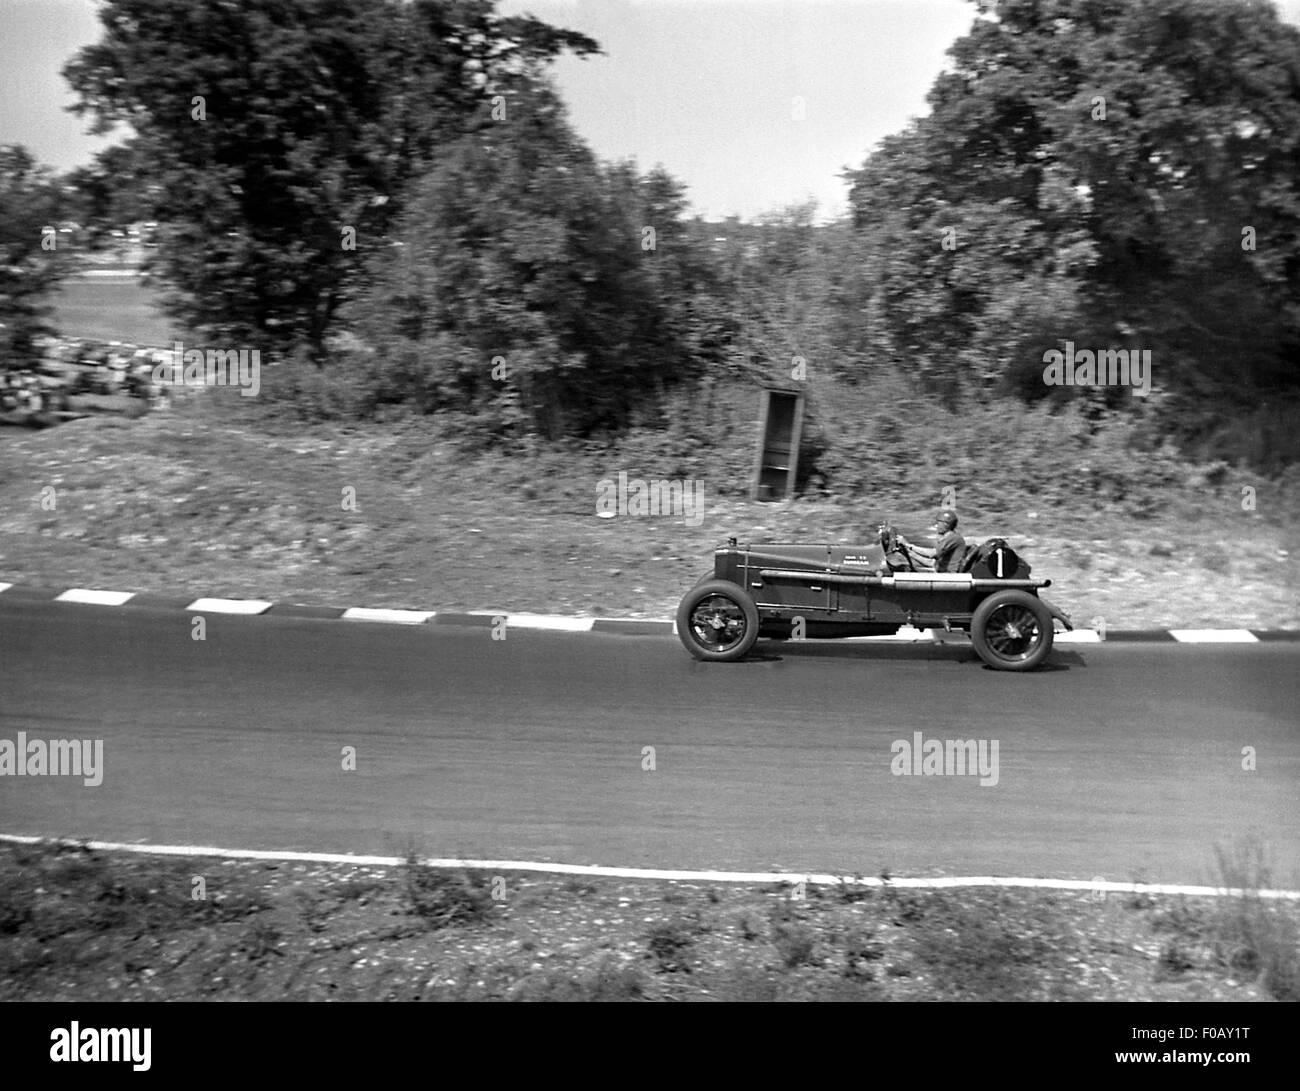 1914 TT Sunbeam at Brands Hatch, UK 1950s - Stock Image